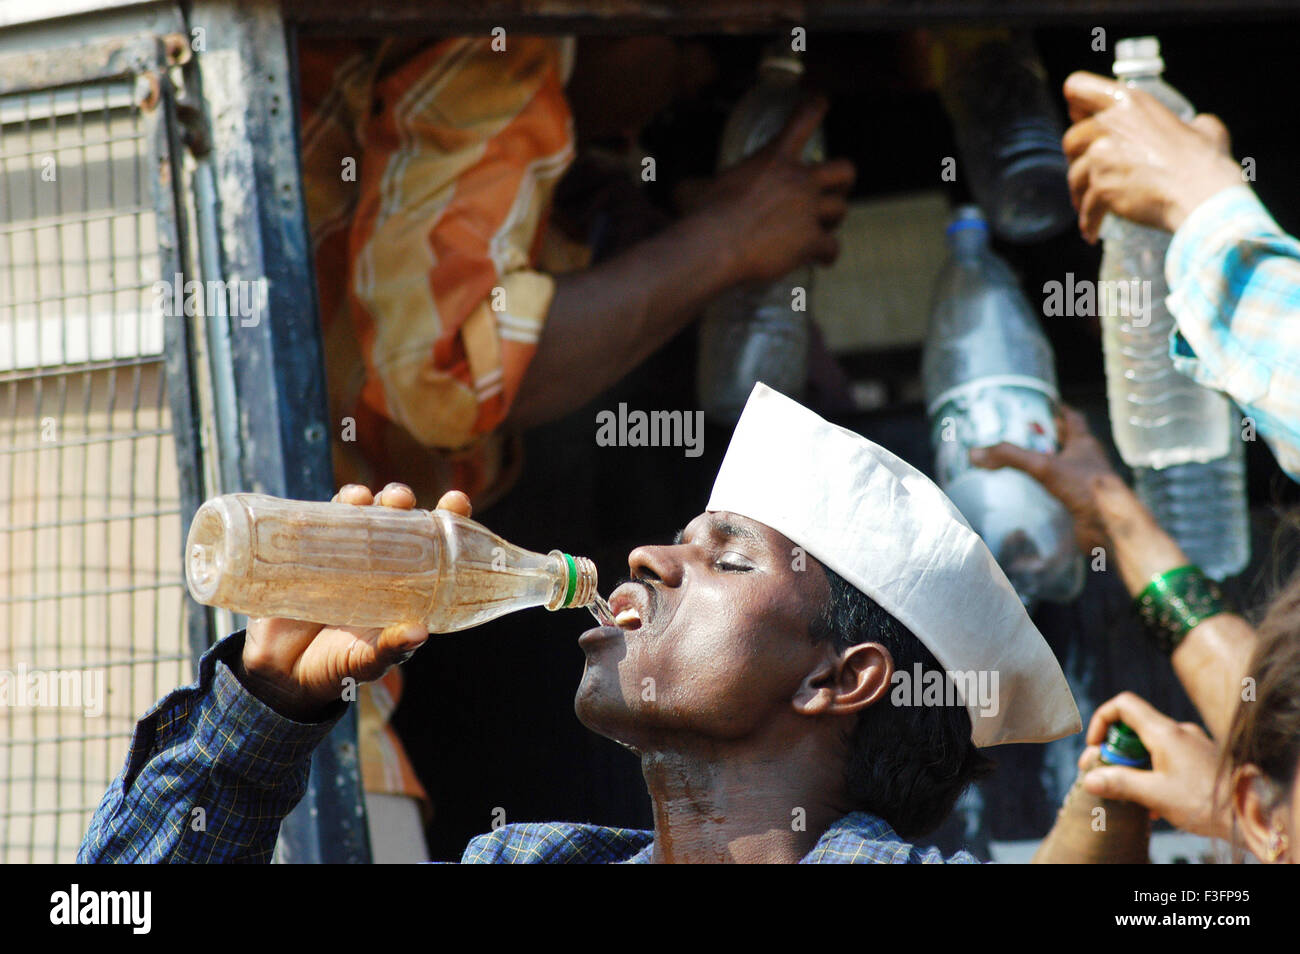 Man quench his thirst by drinking water form plastic bottle ; Bombay Mumbai ; Maharashtra ; India - Stock Image